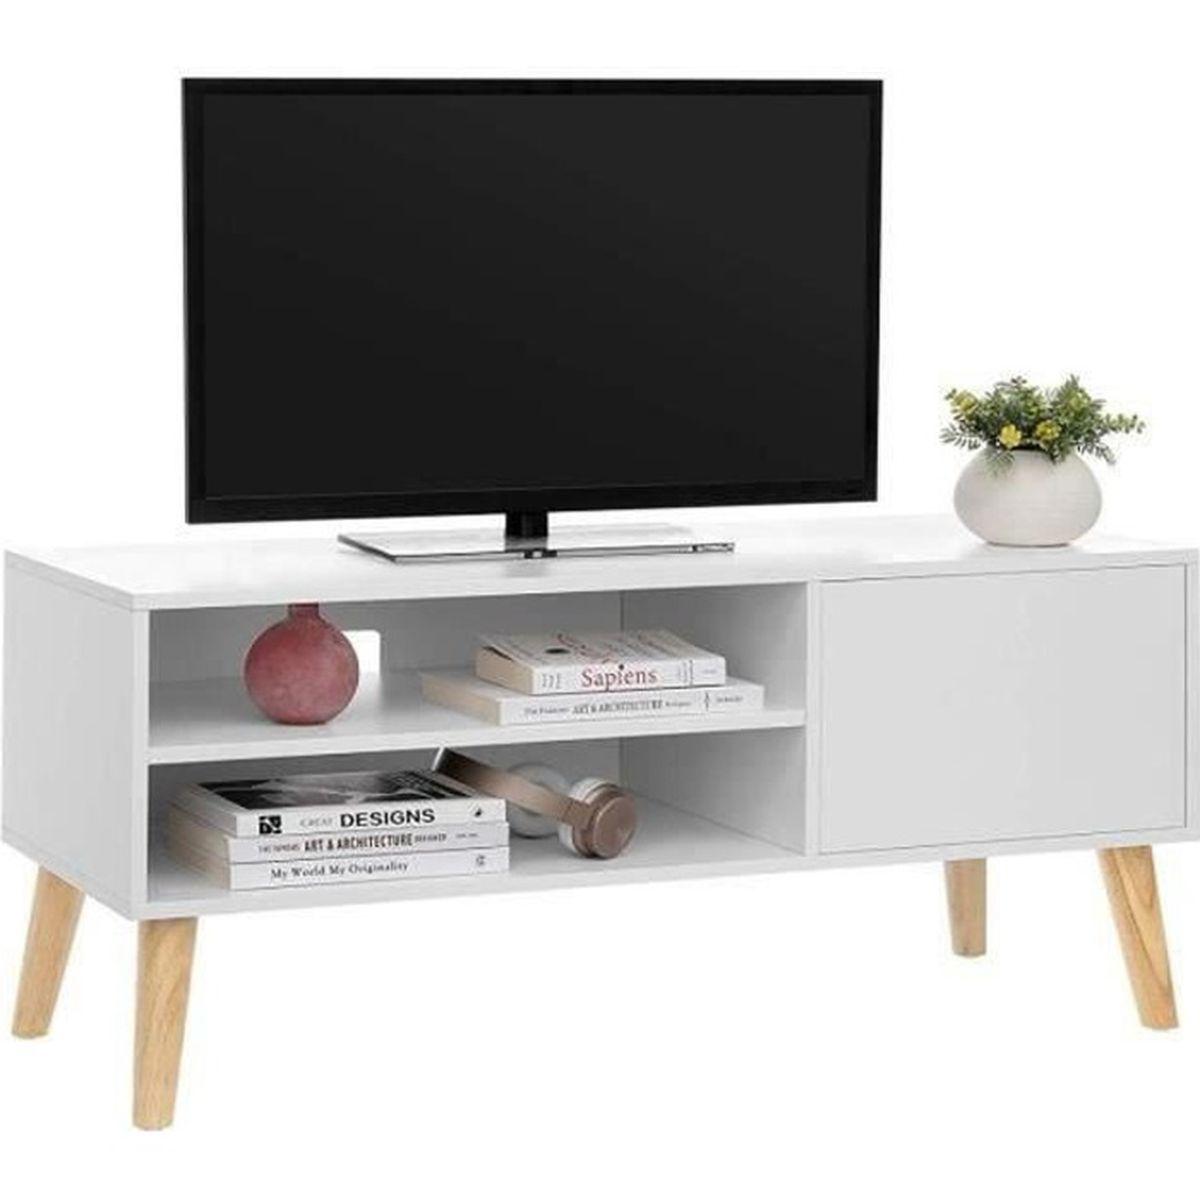 Vasagle Meuble Tv 110 X 40 X 49 5 Cm Style Scandinave Buffet Bas Blanc Ltv09wt Achat Vente Meuble Tv Vasagle Meuble Tv 110 X 40 Cdiscount